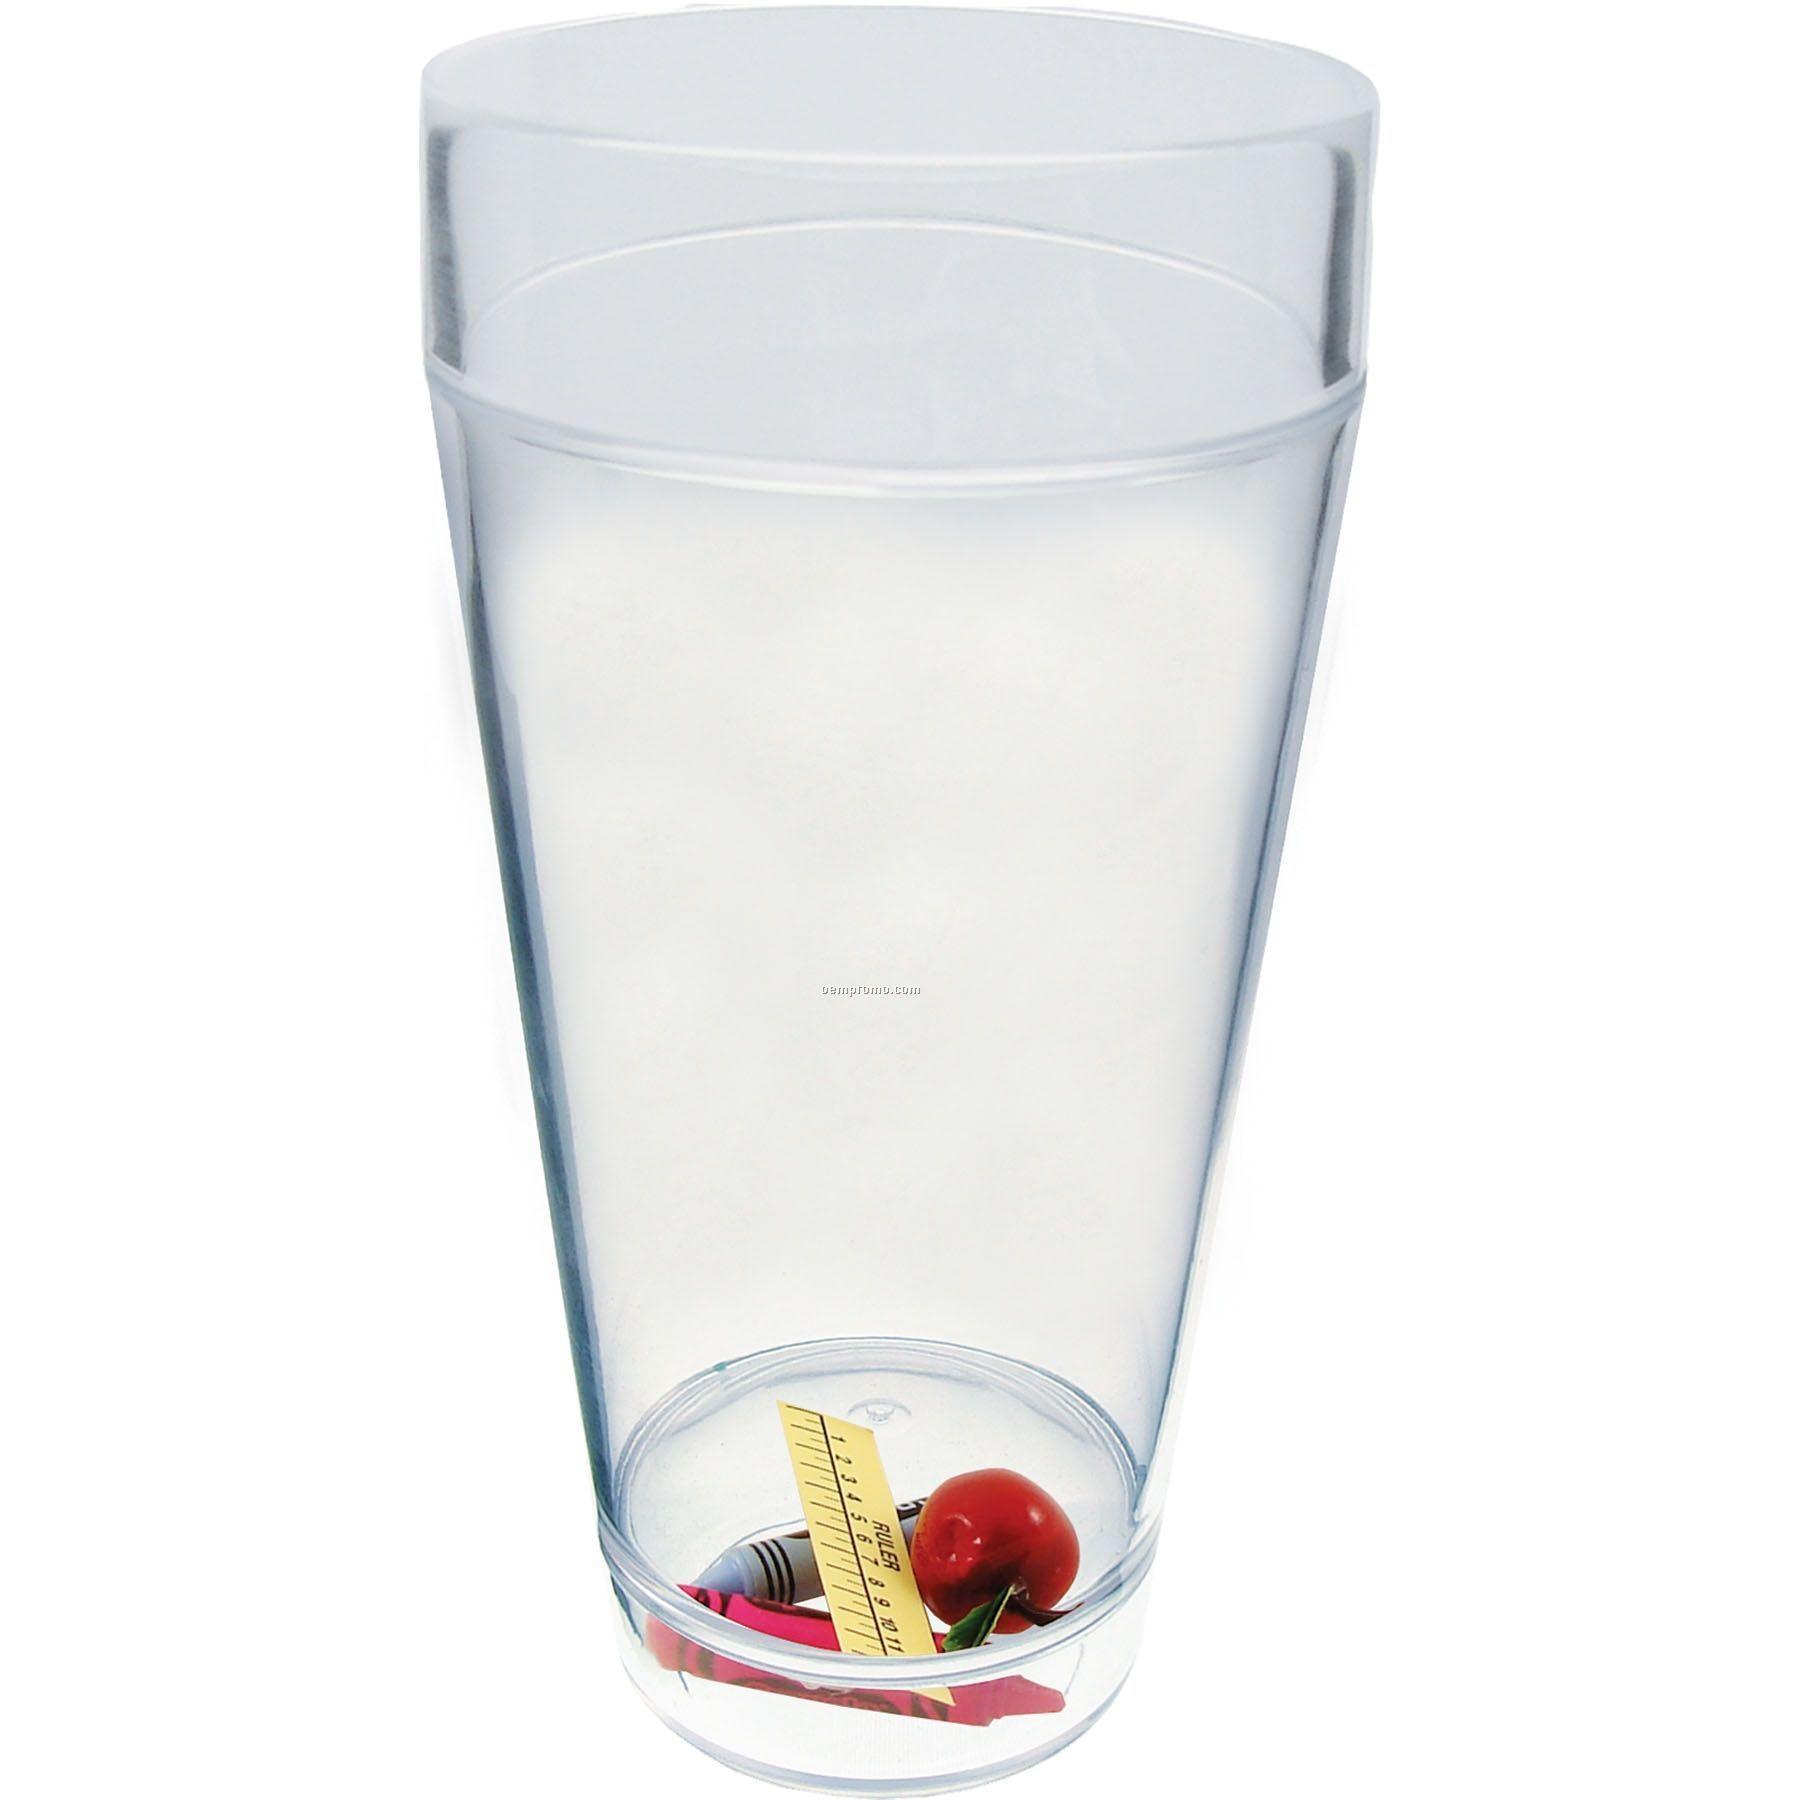 20 Oz. Teacher Compartment Cup